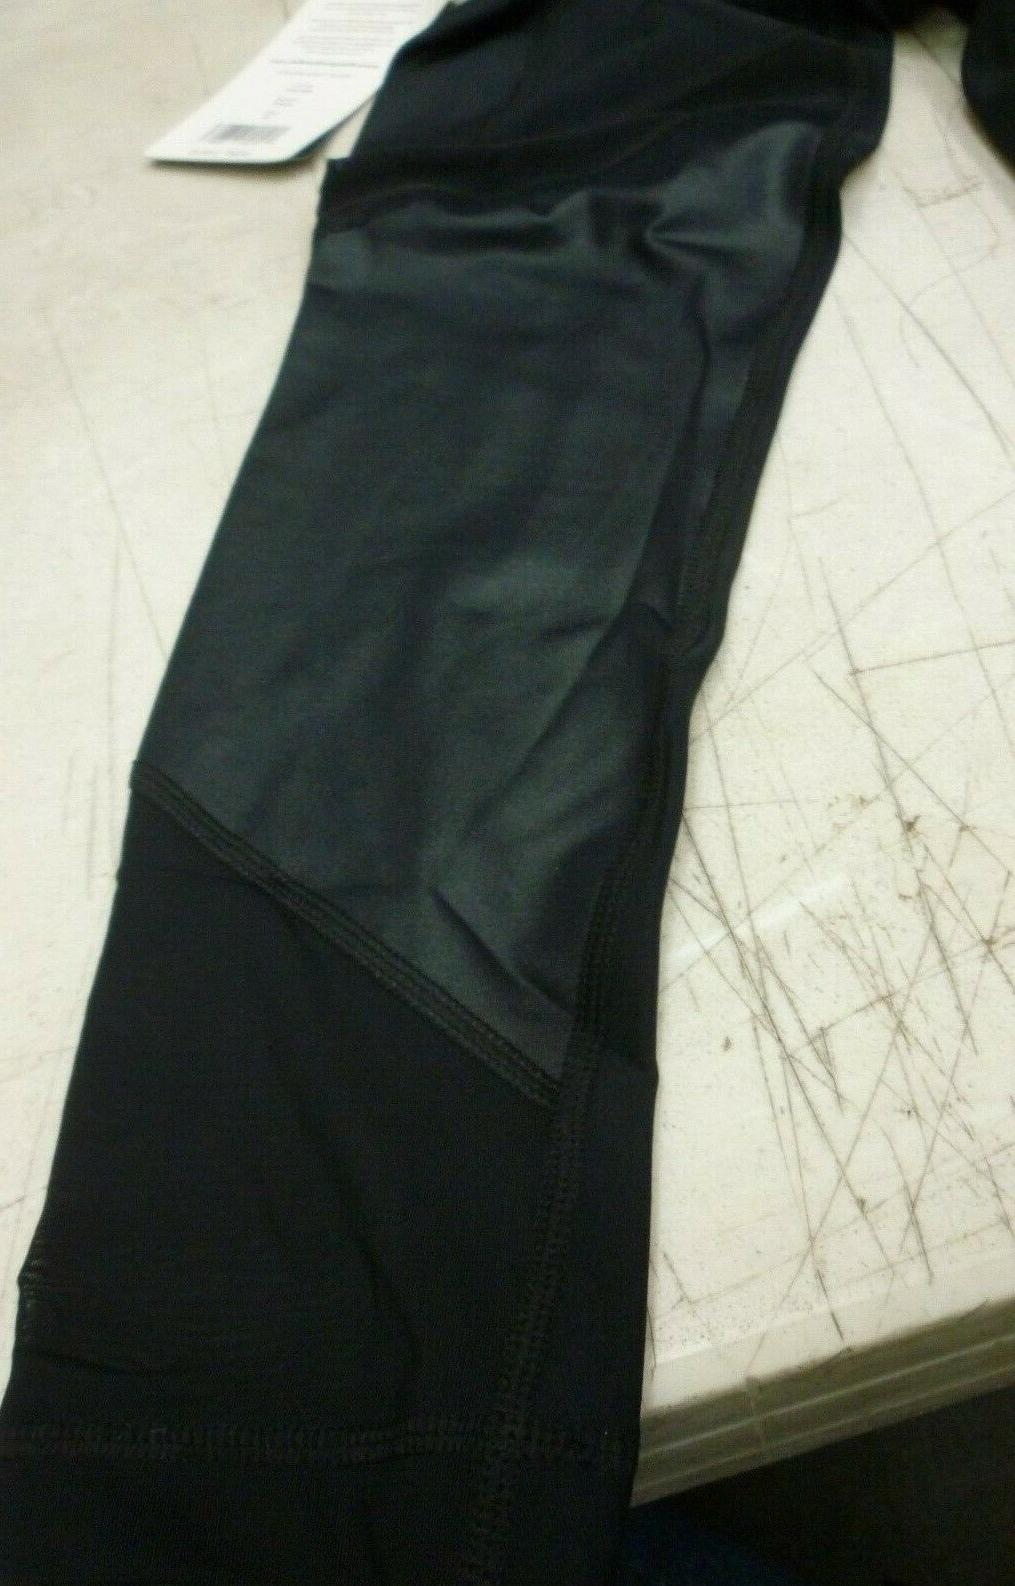 NEW Degree Reflex tight black, PW72421